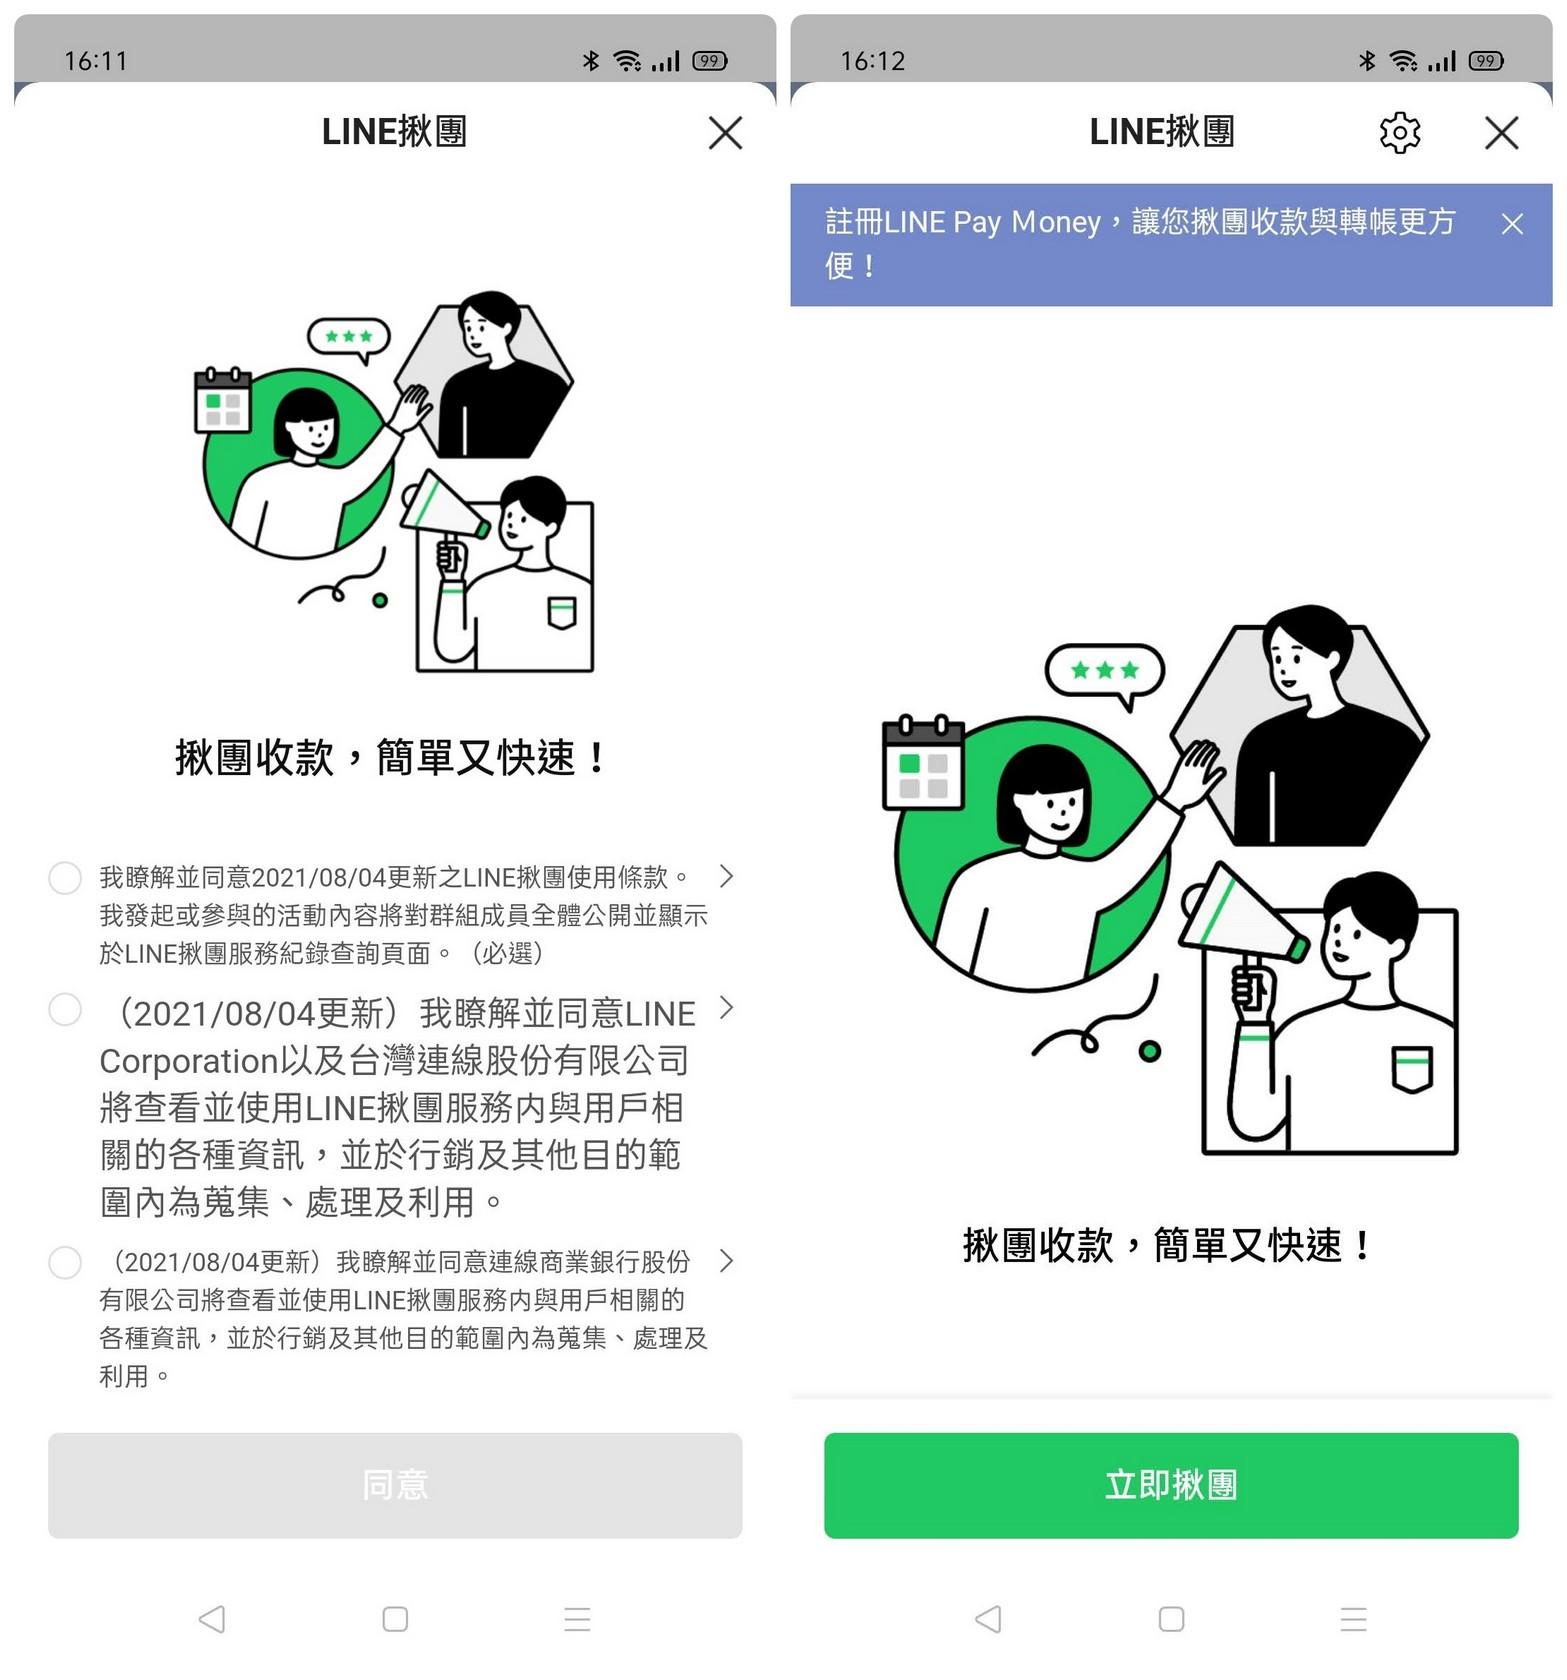 Line揪團 團購開團新功能 透過LinePay、LineBank快速收款